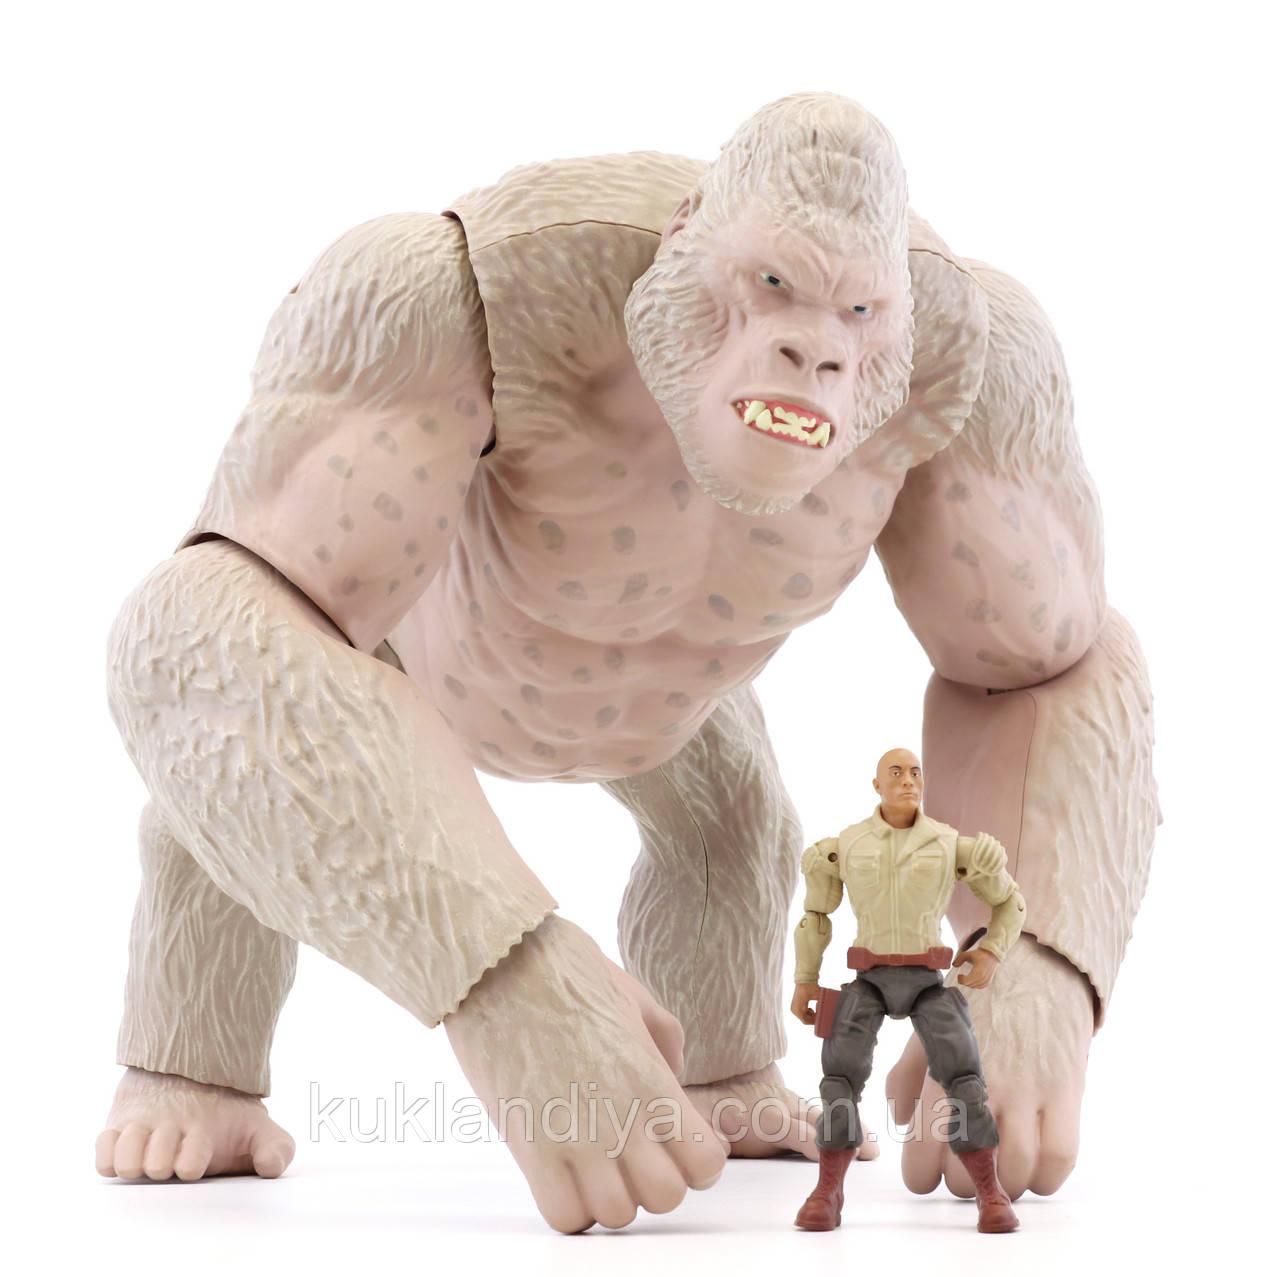 Игрушка горилла Мега-Джордж Рэмпейдж